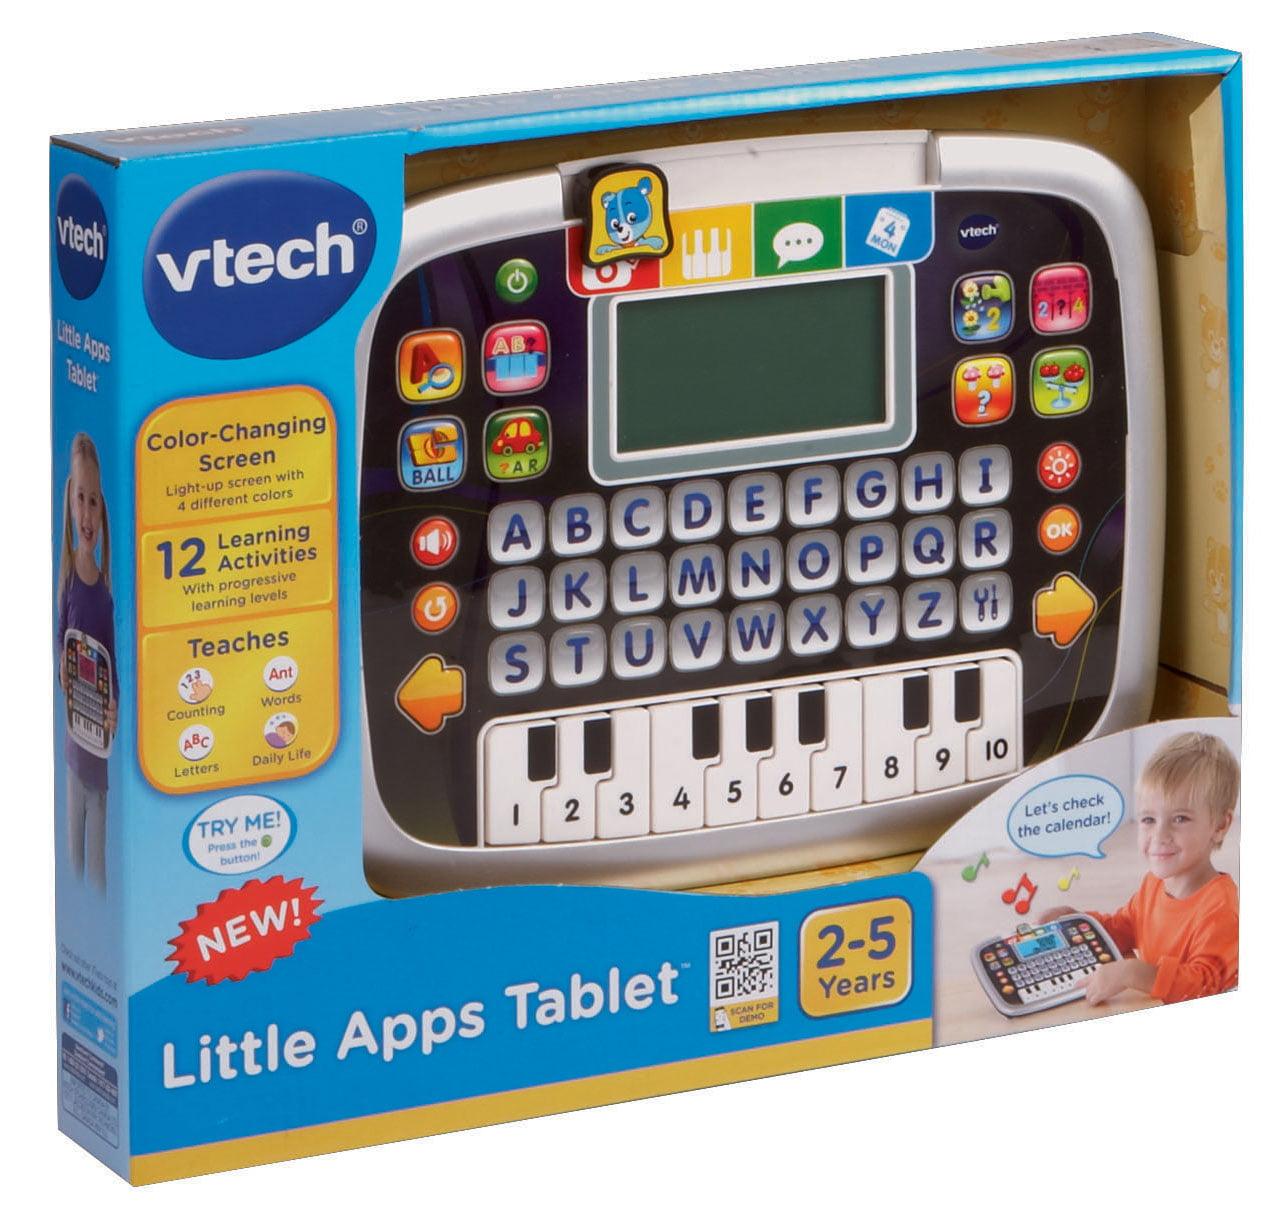 Vtech Little Apps Tablet Tablet For Toddlers Learning Toy Walmart Com Walmart Com